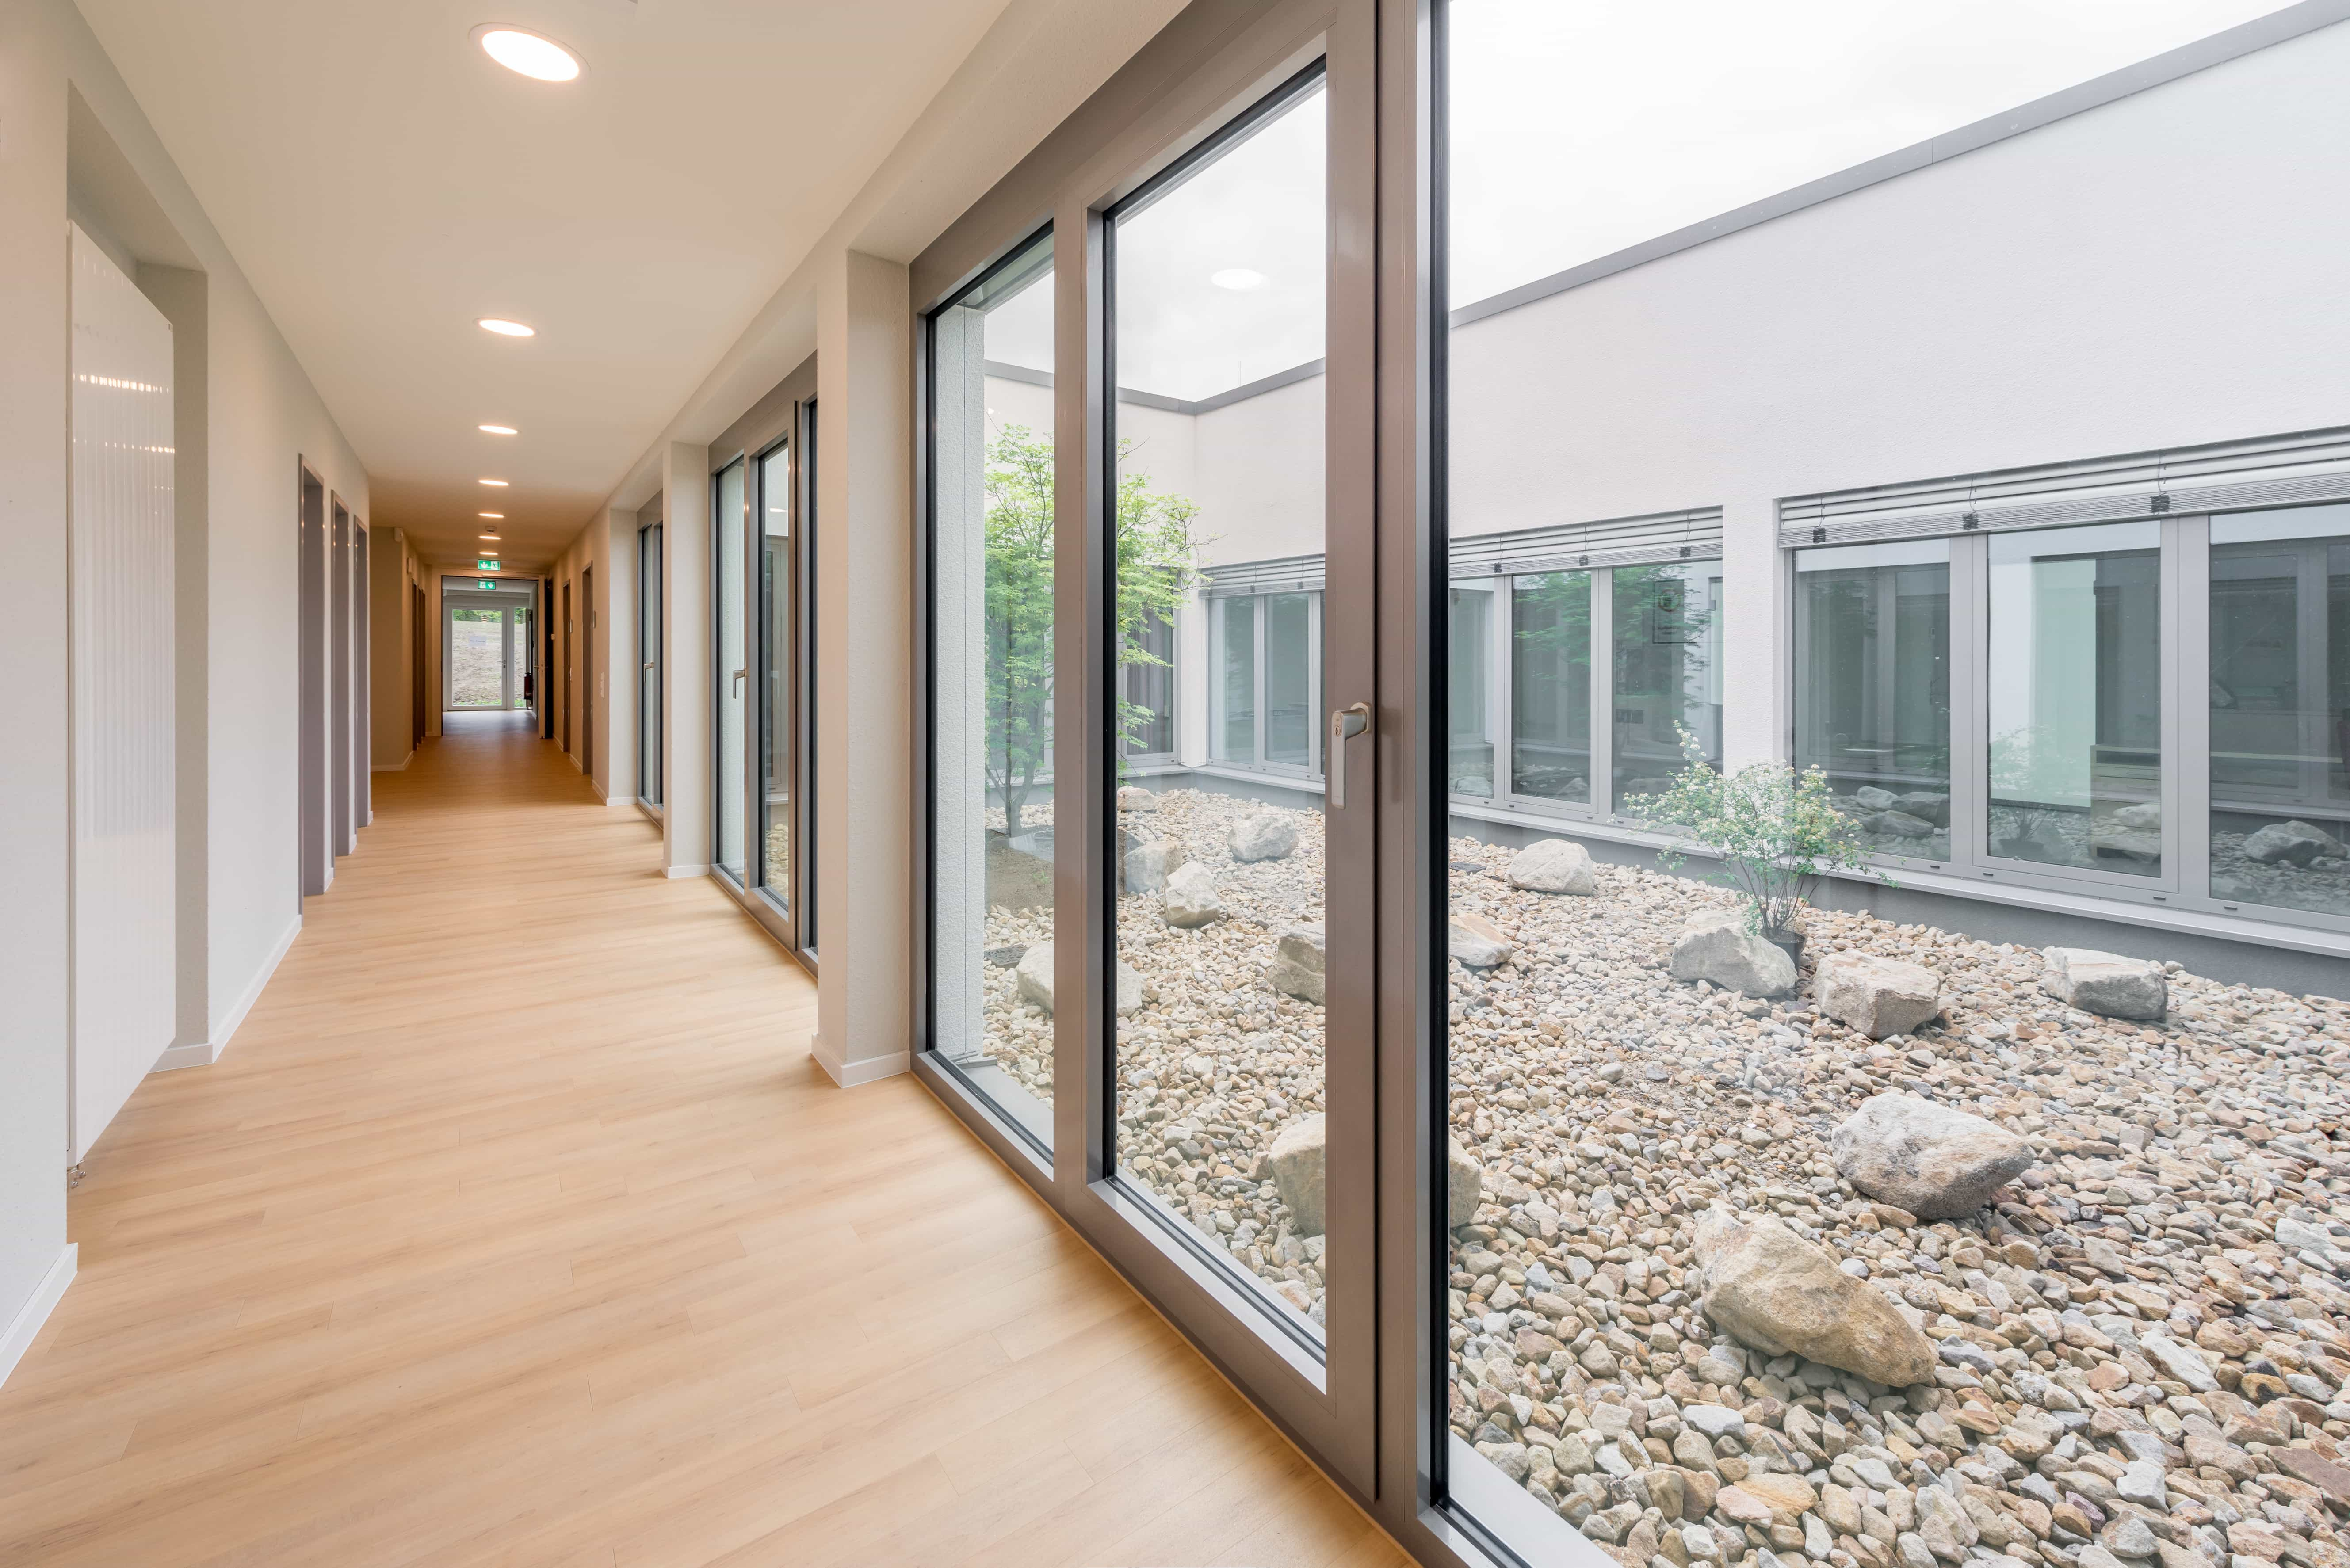 sektor3architekten-Onco-Cubus-Neubau-Strahlentherapie-Onkologie-Recklinghausen